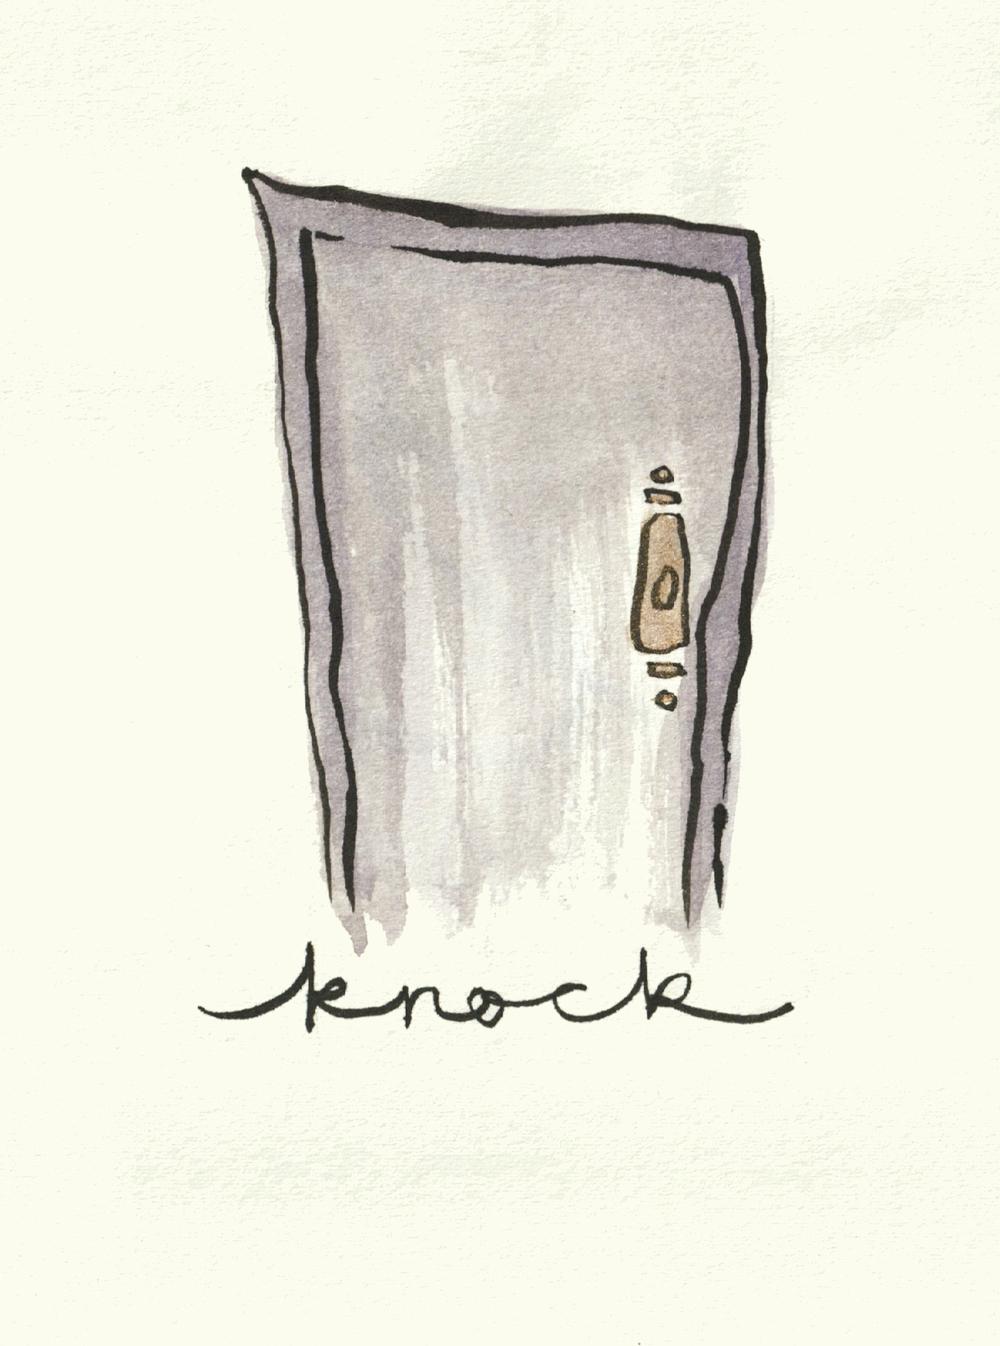 K_Knock.jpg